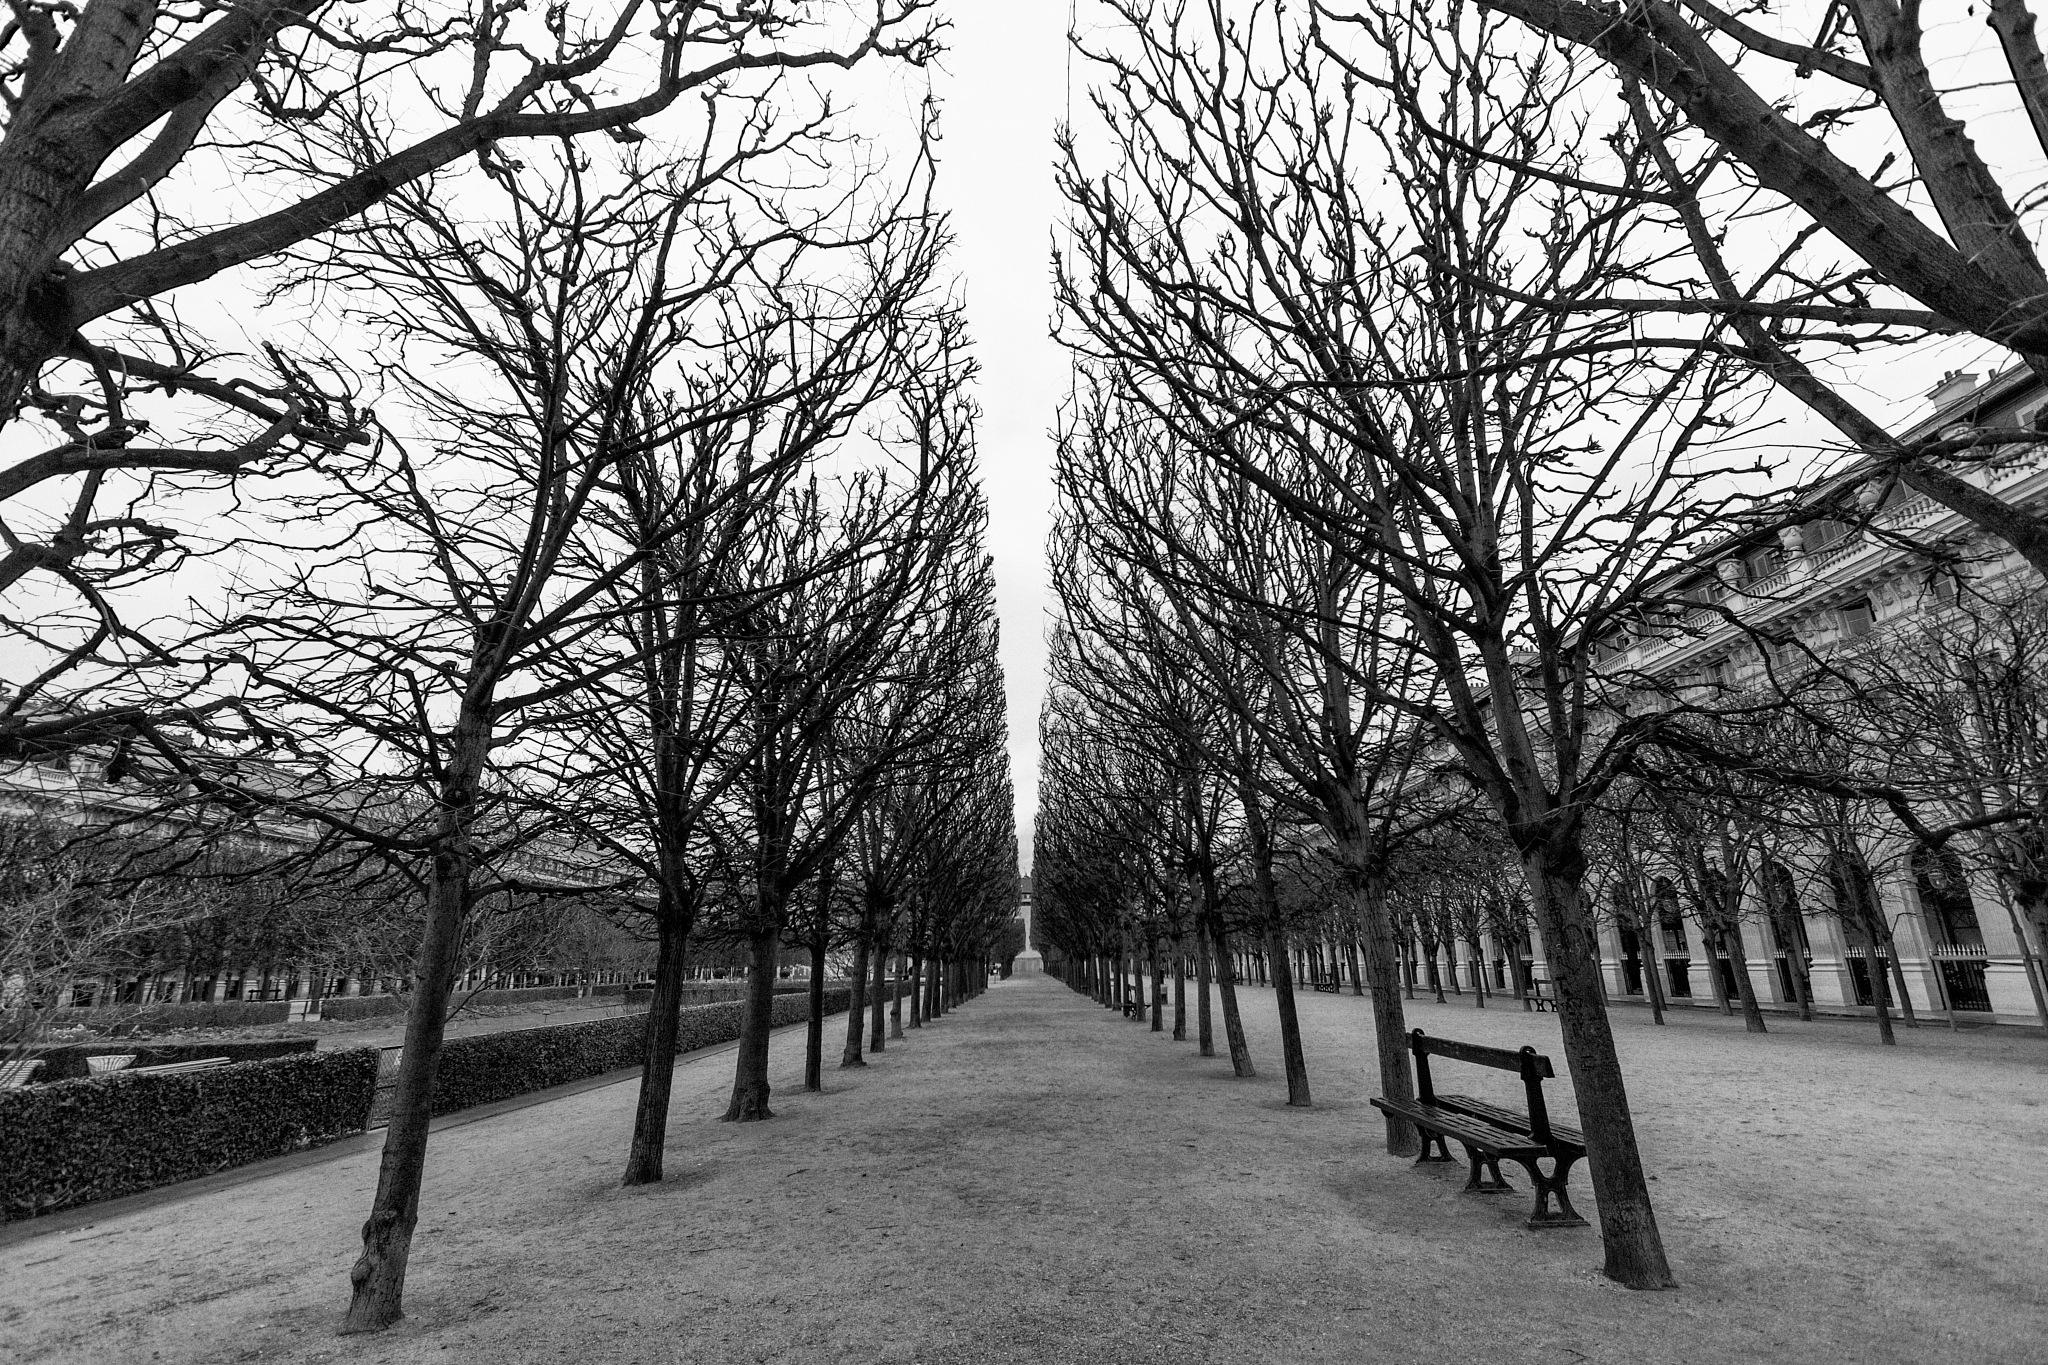 Tuillerie Garden by monicacfotografia